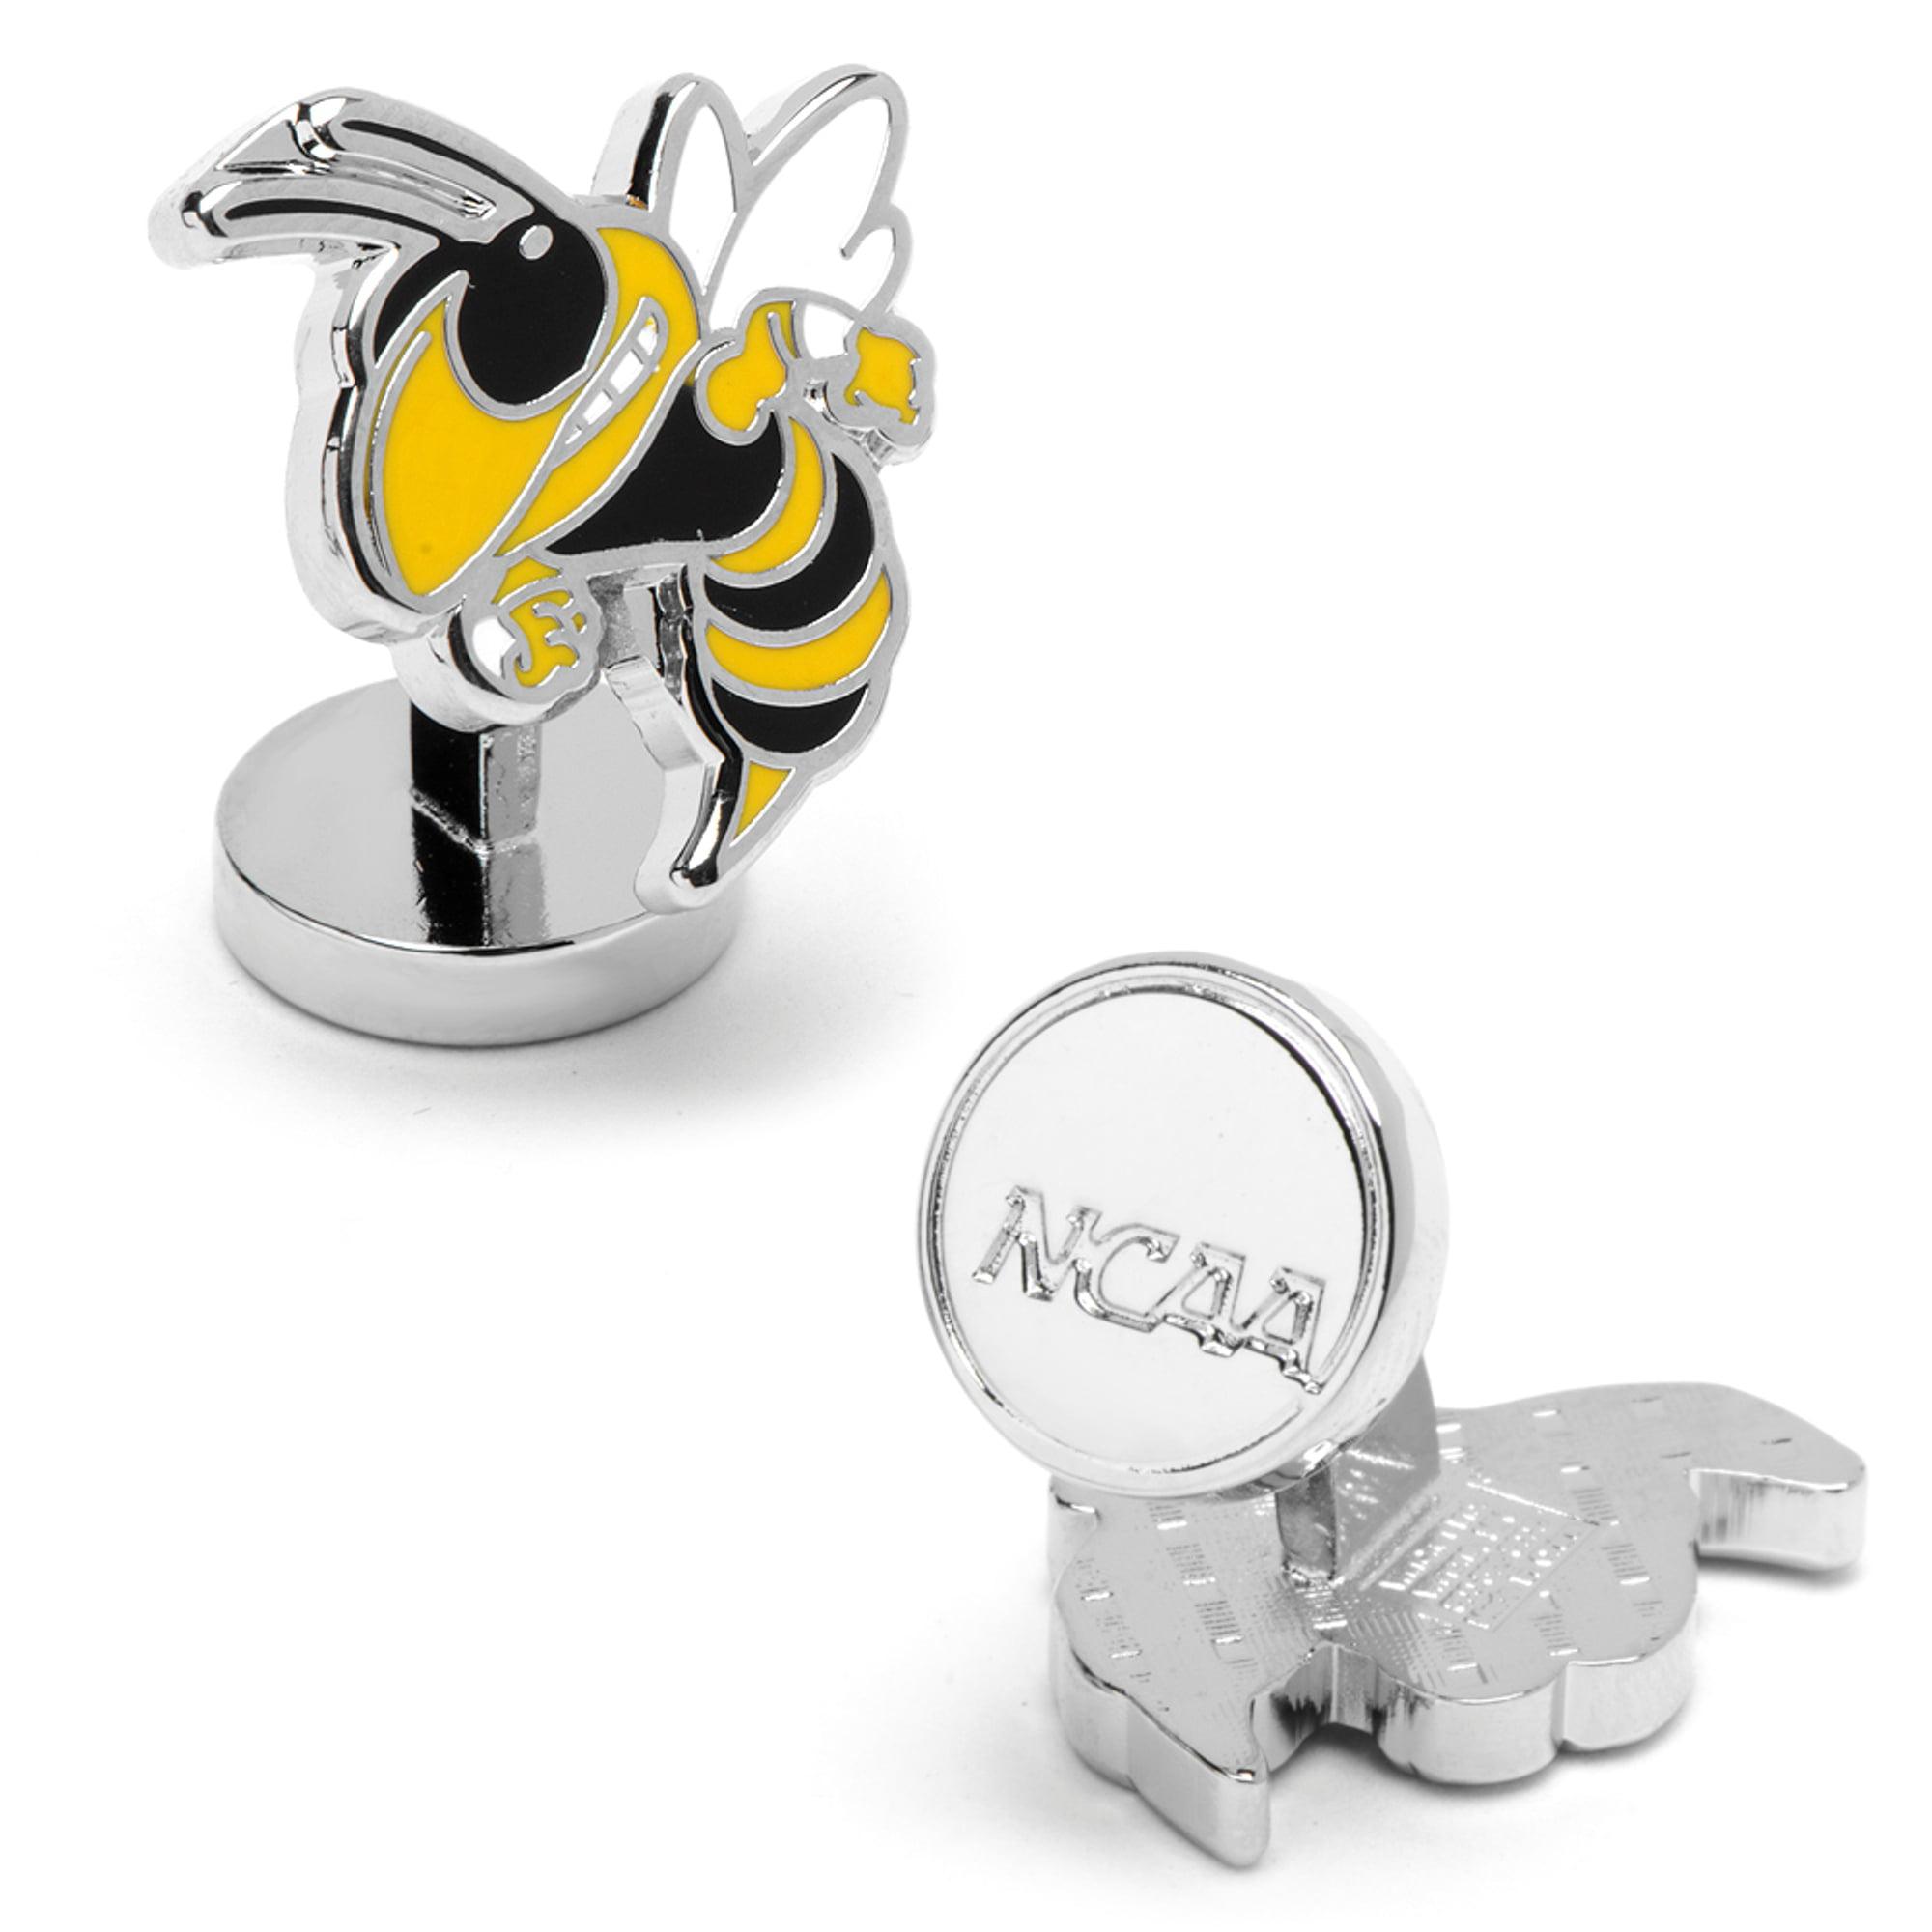 Cufflinks Inc. NCAA Georgia Tech Yellow Jackets Cufflinks